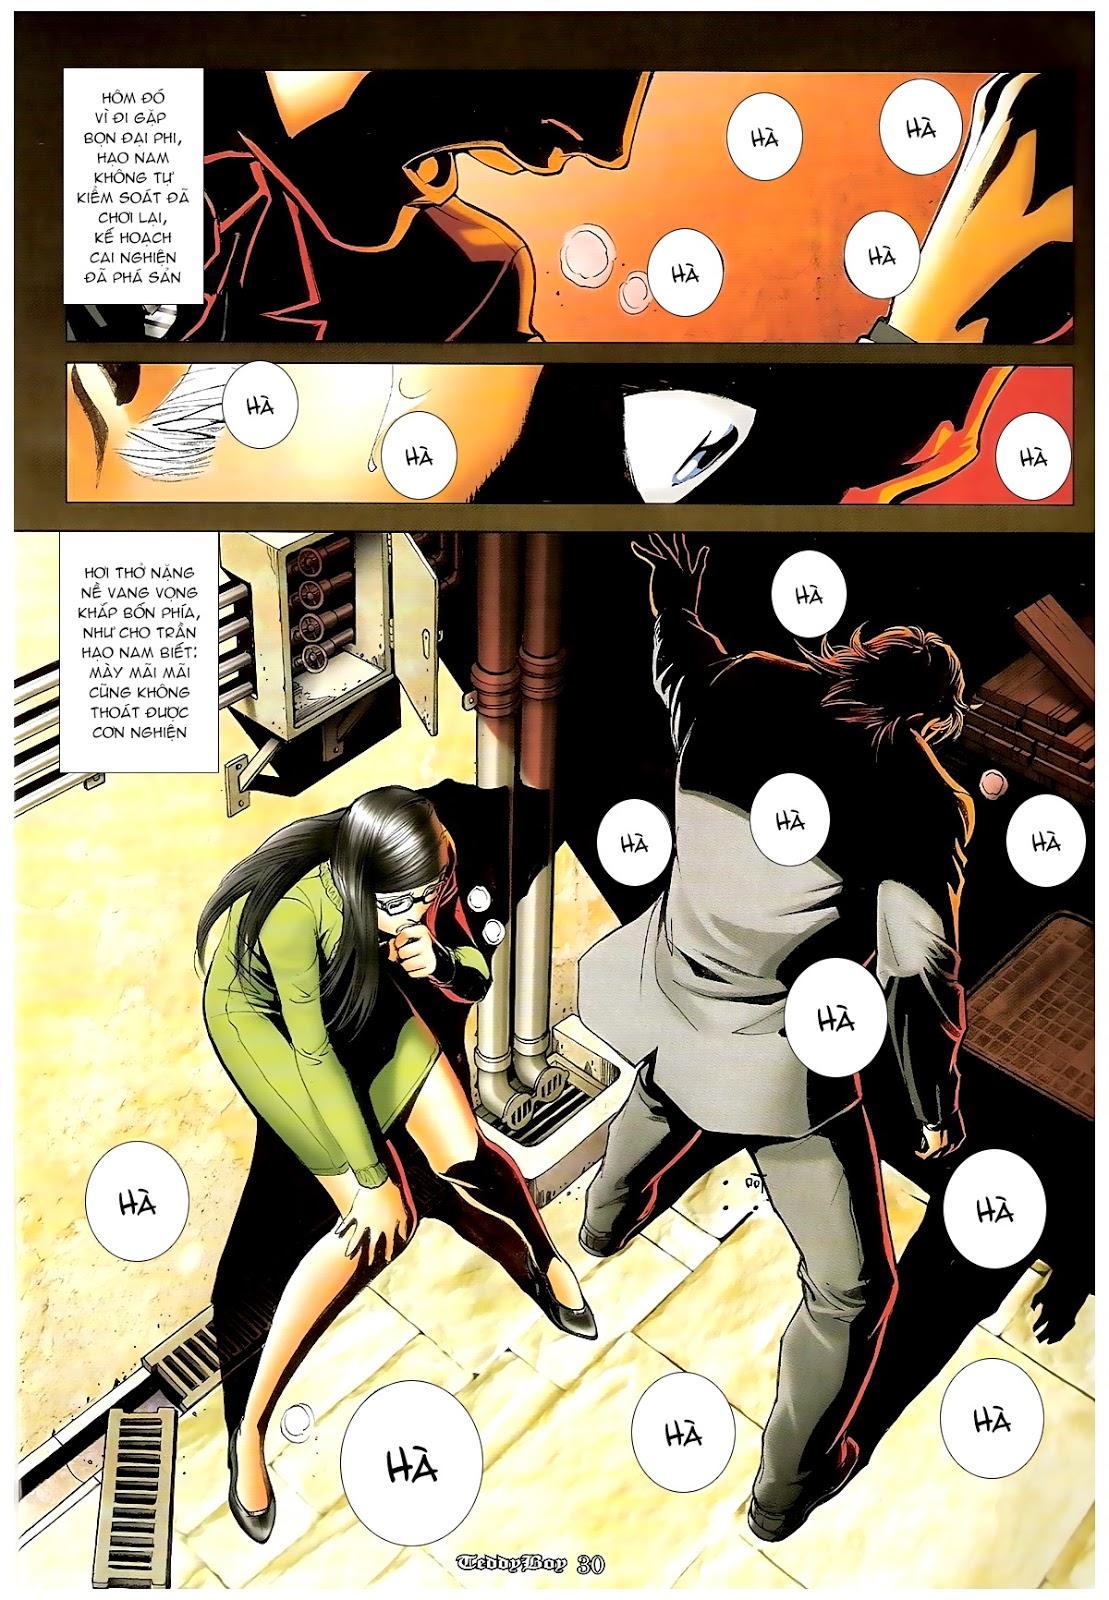 Người Trong Giang Hồ - Chapter 1209: Cai nghiện - Pic 27